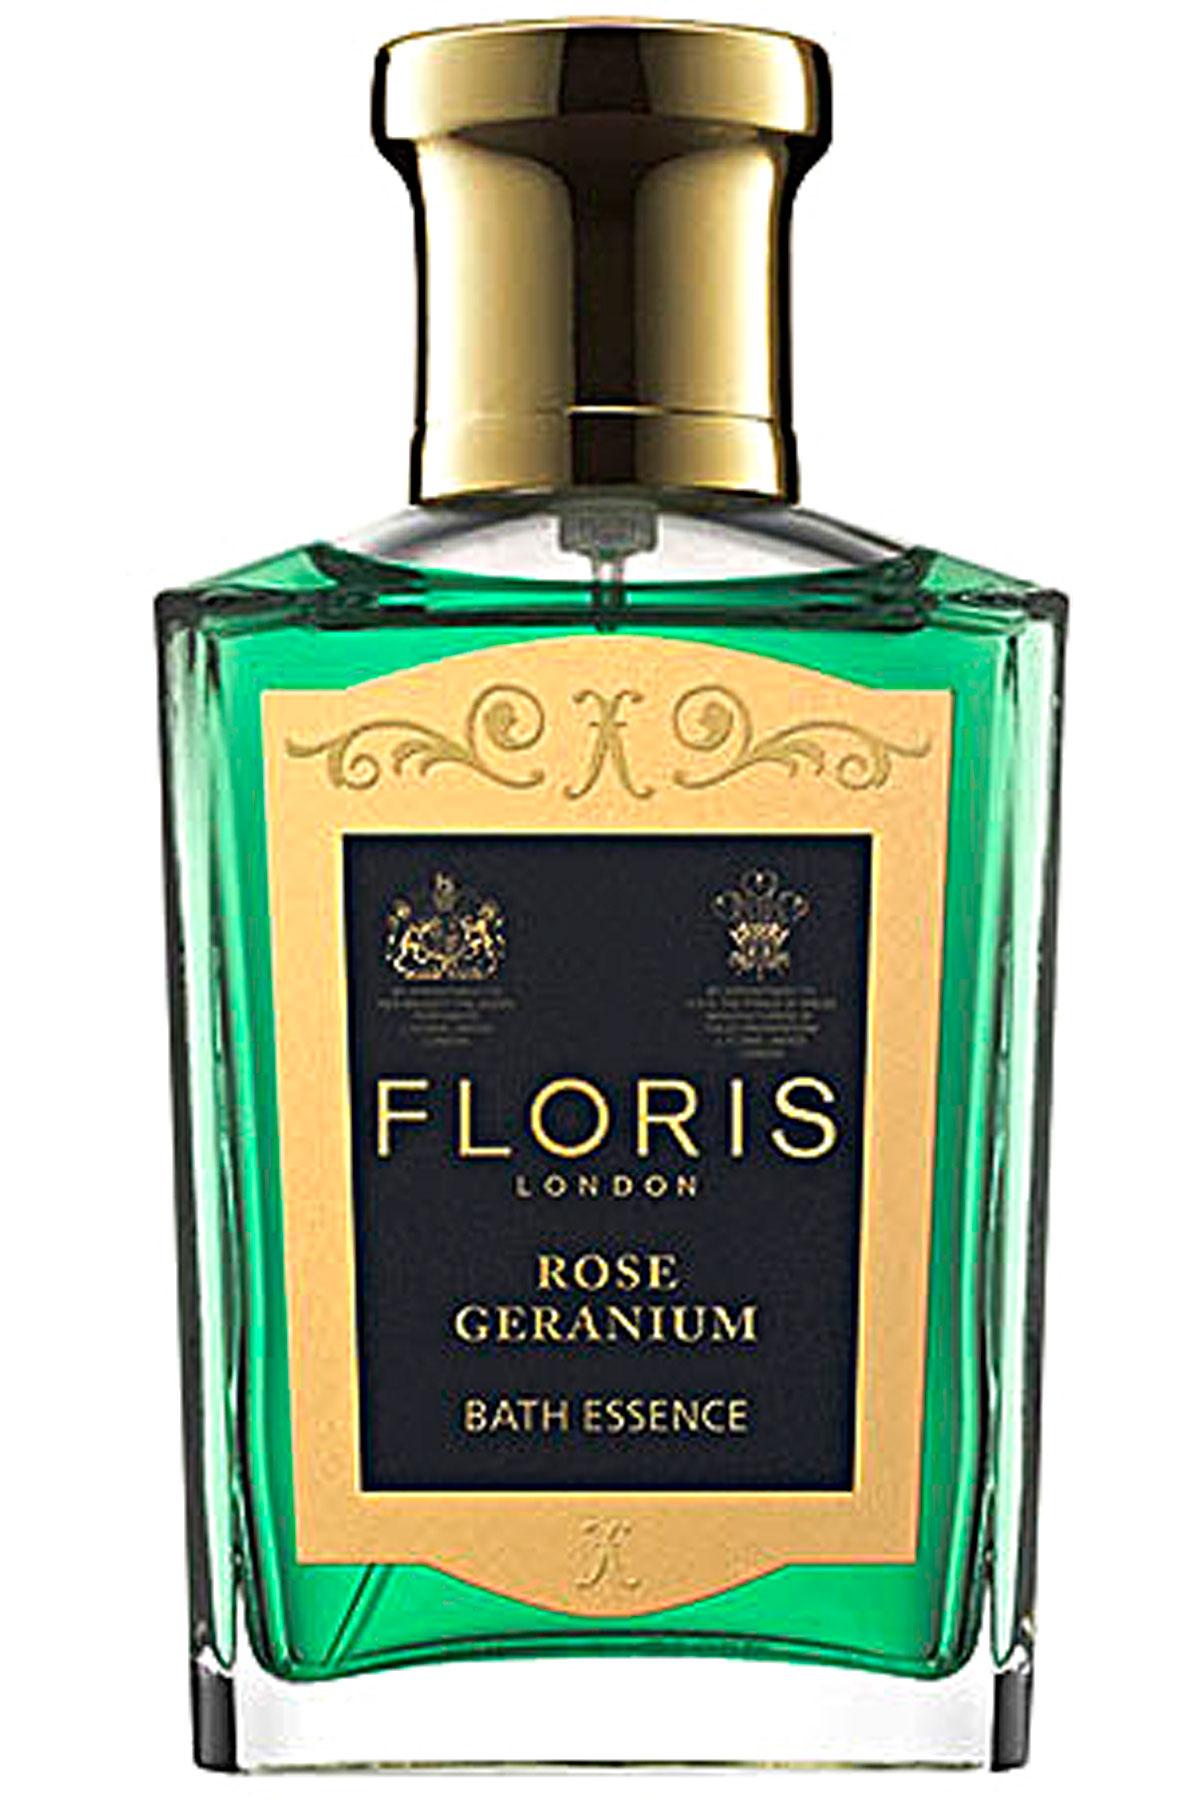 Floris London Beauty for Women On Sale, Rose Geranium - Bath Essence - 50 Ml, 2019, 50 ml